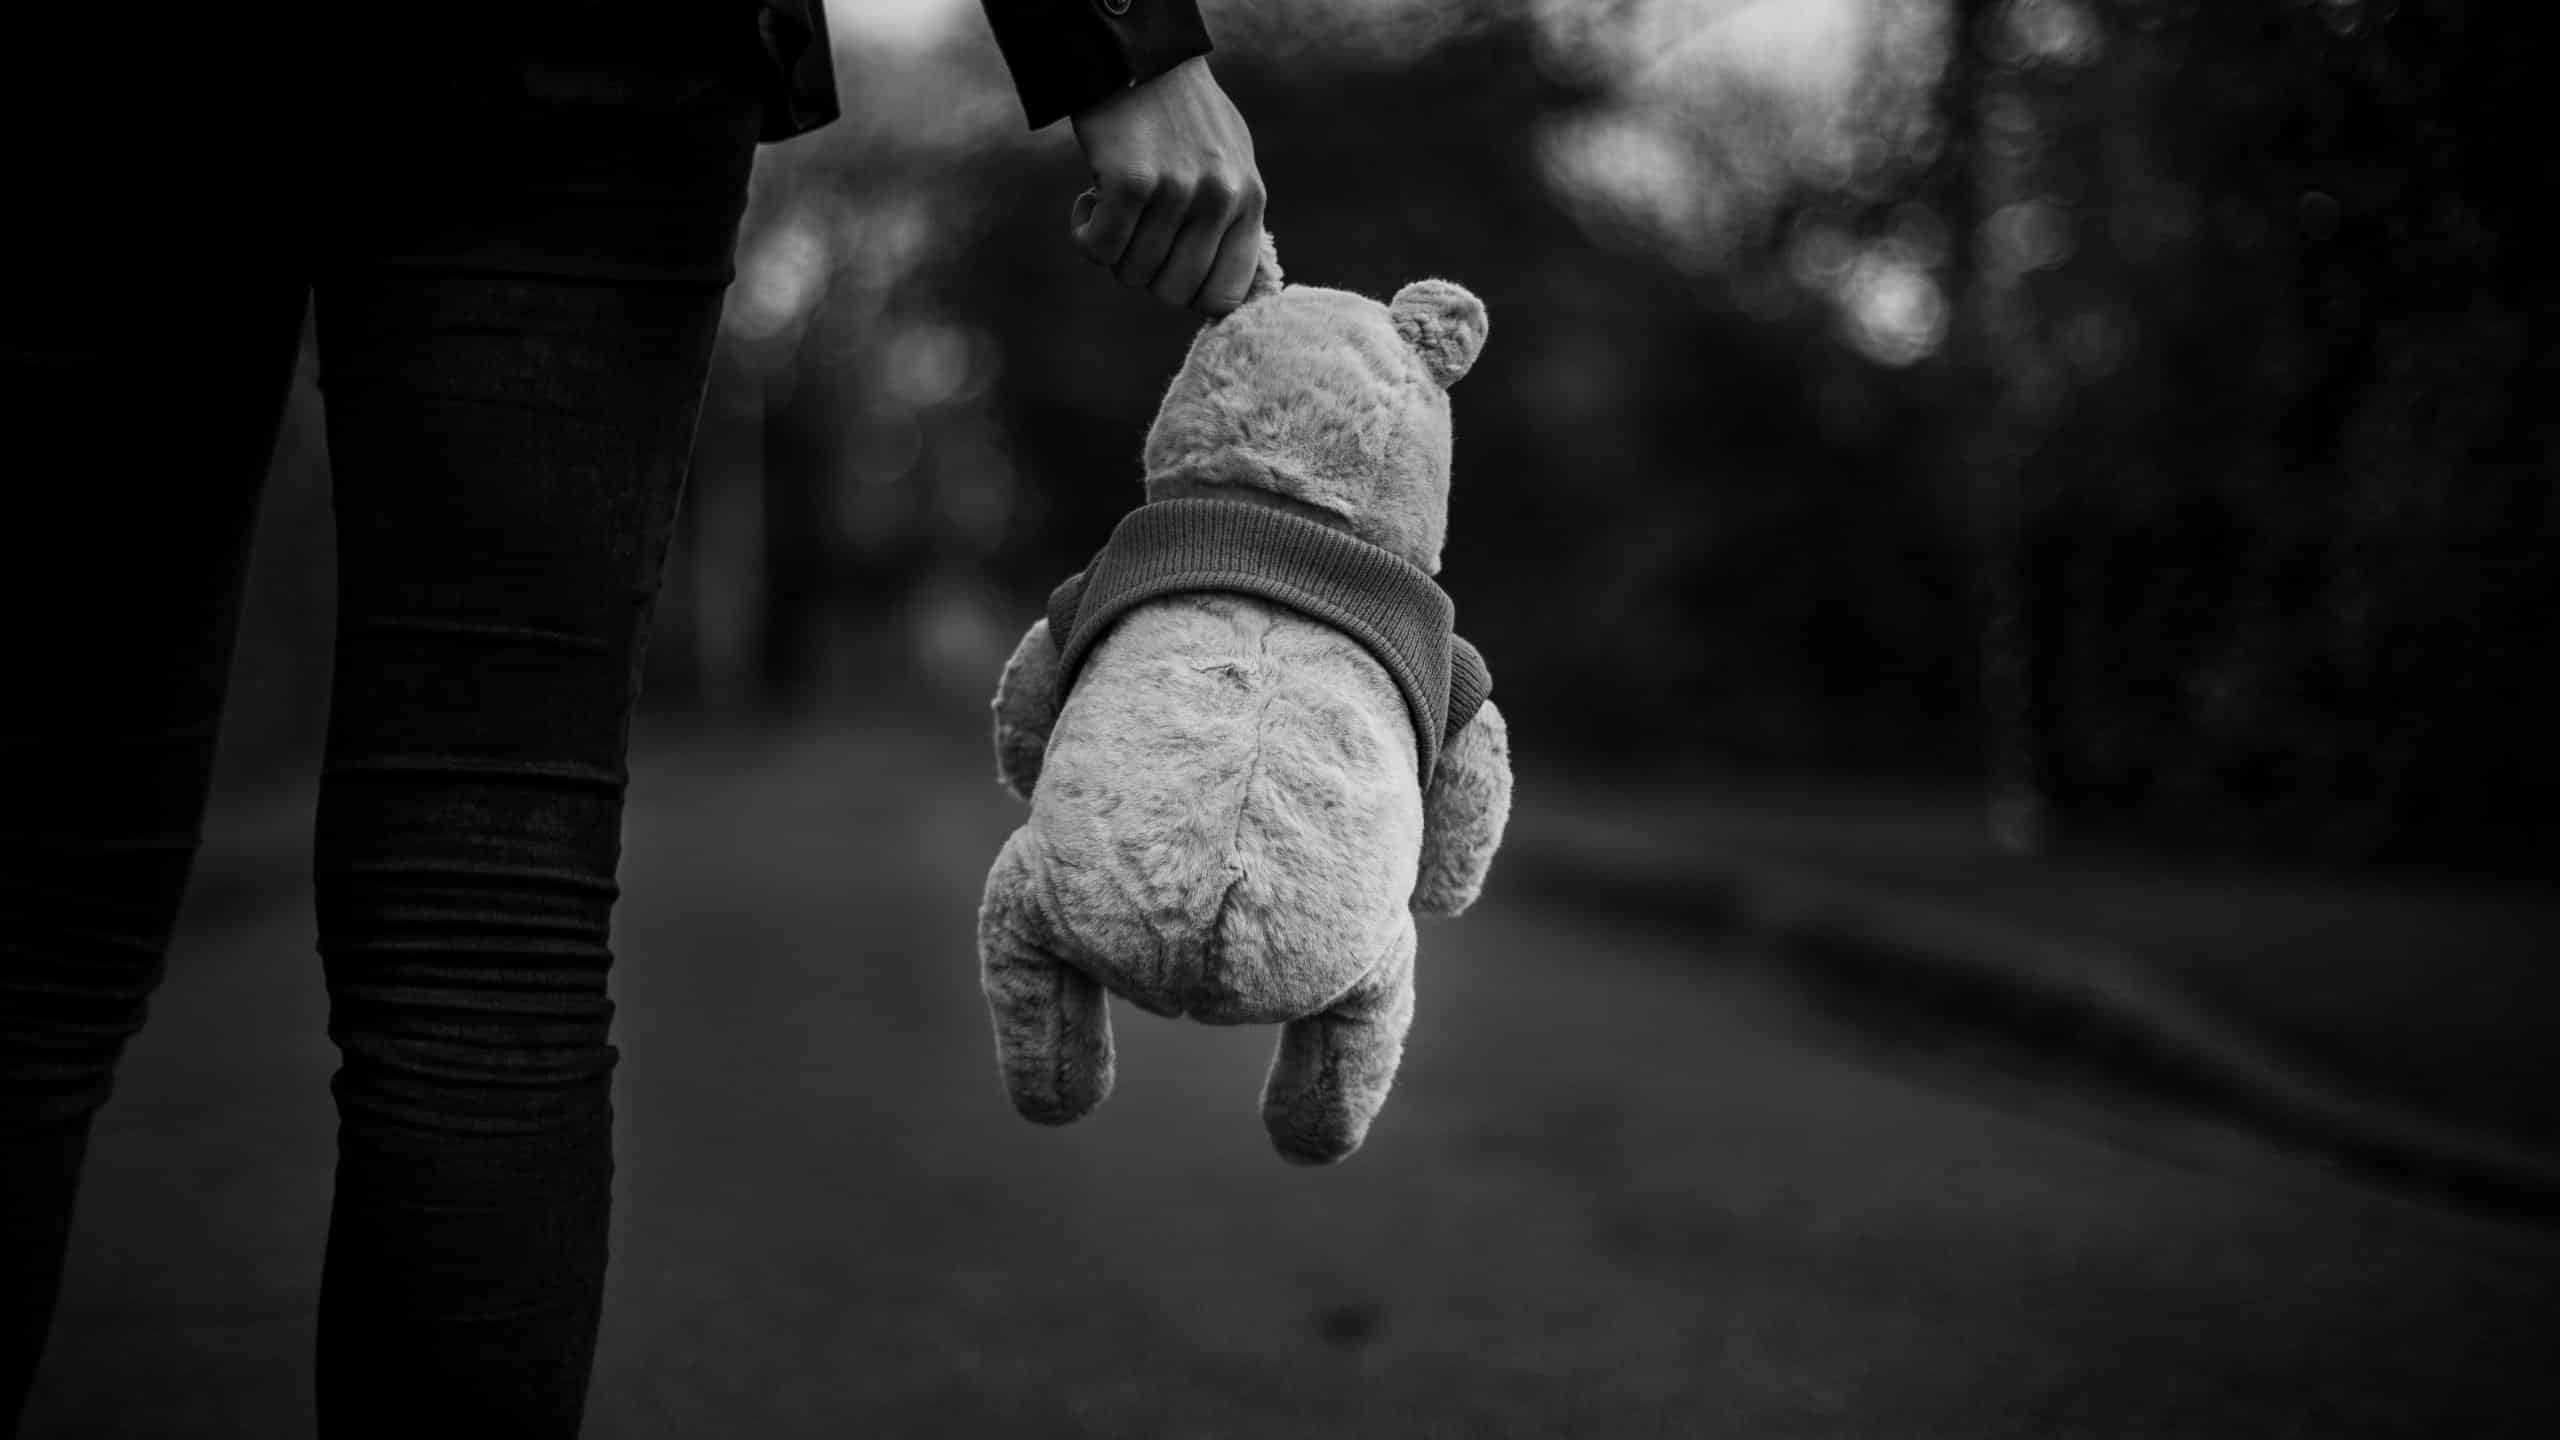 winnie the pooh mental health